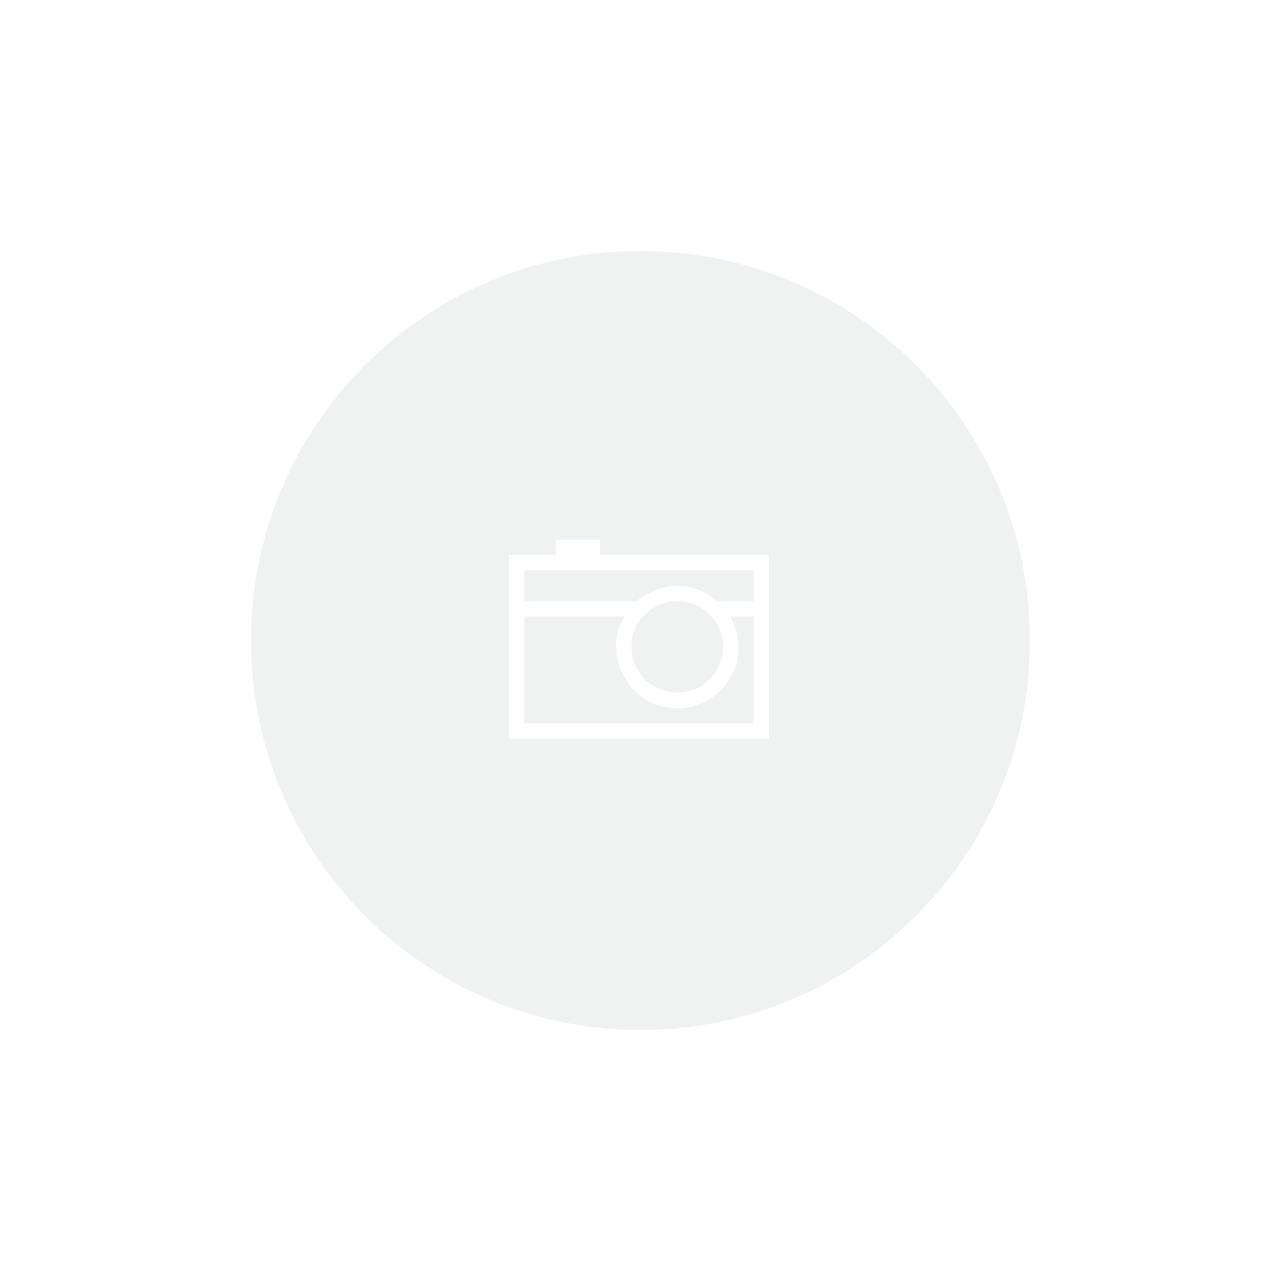 PLACA DE VIDEO ZOTAC AMP GTX1060 6GB DUAL FAN,  ZT-P10600B-10M